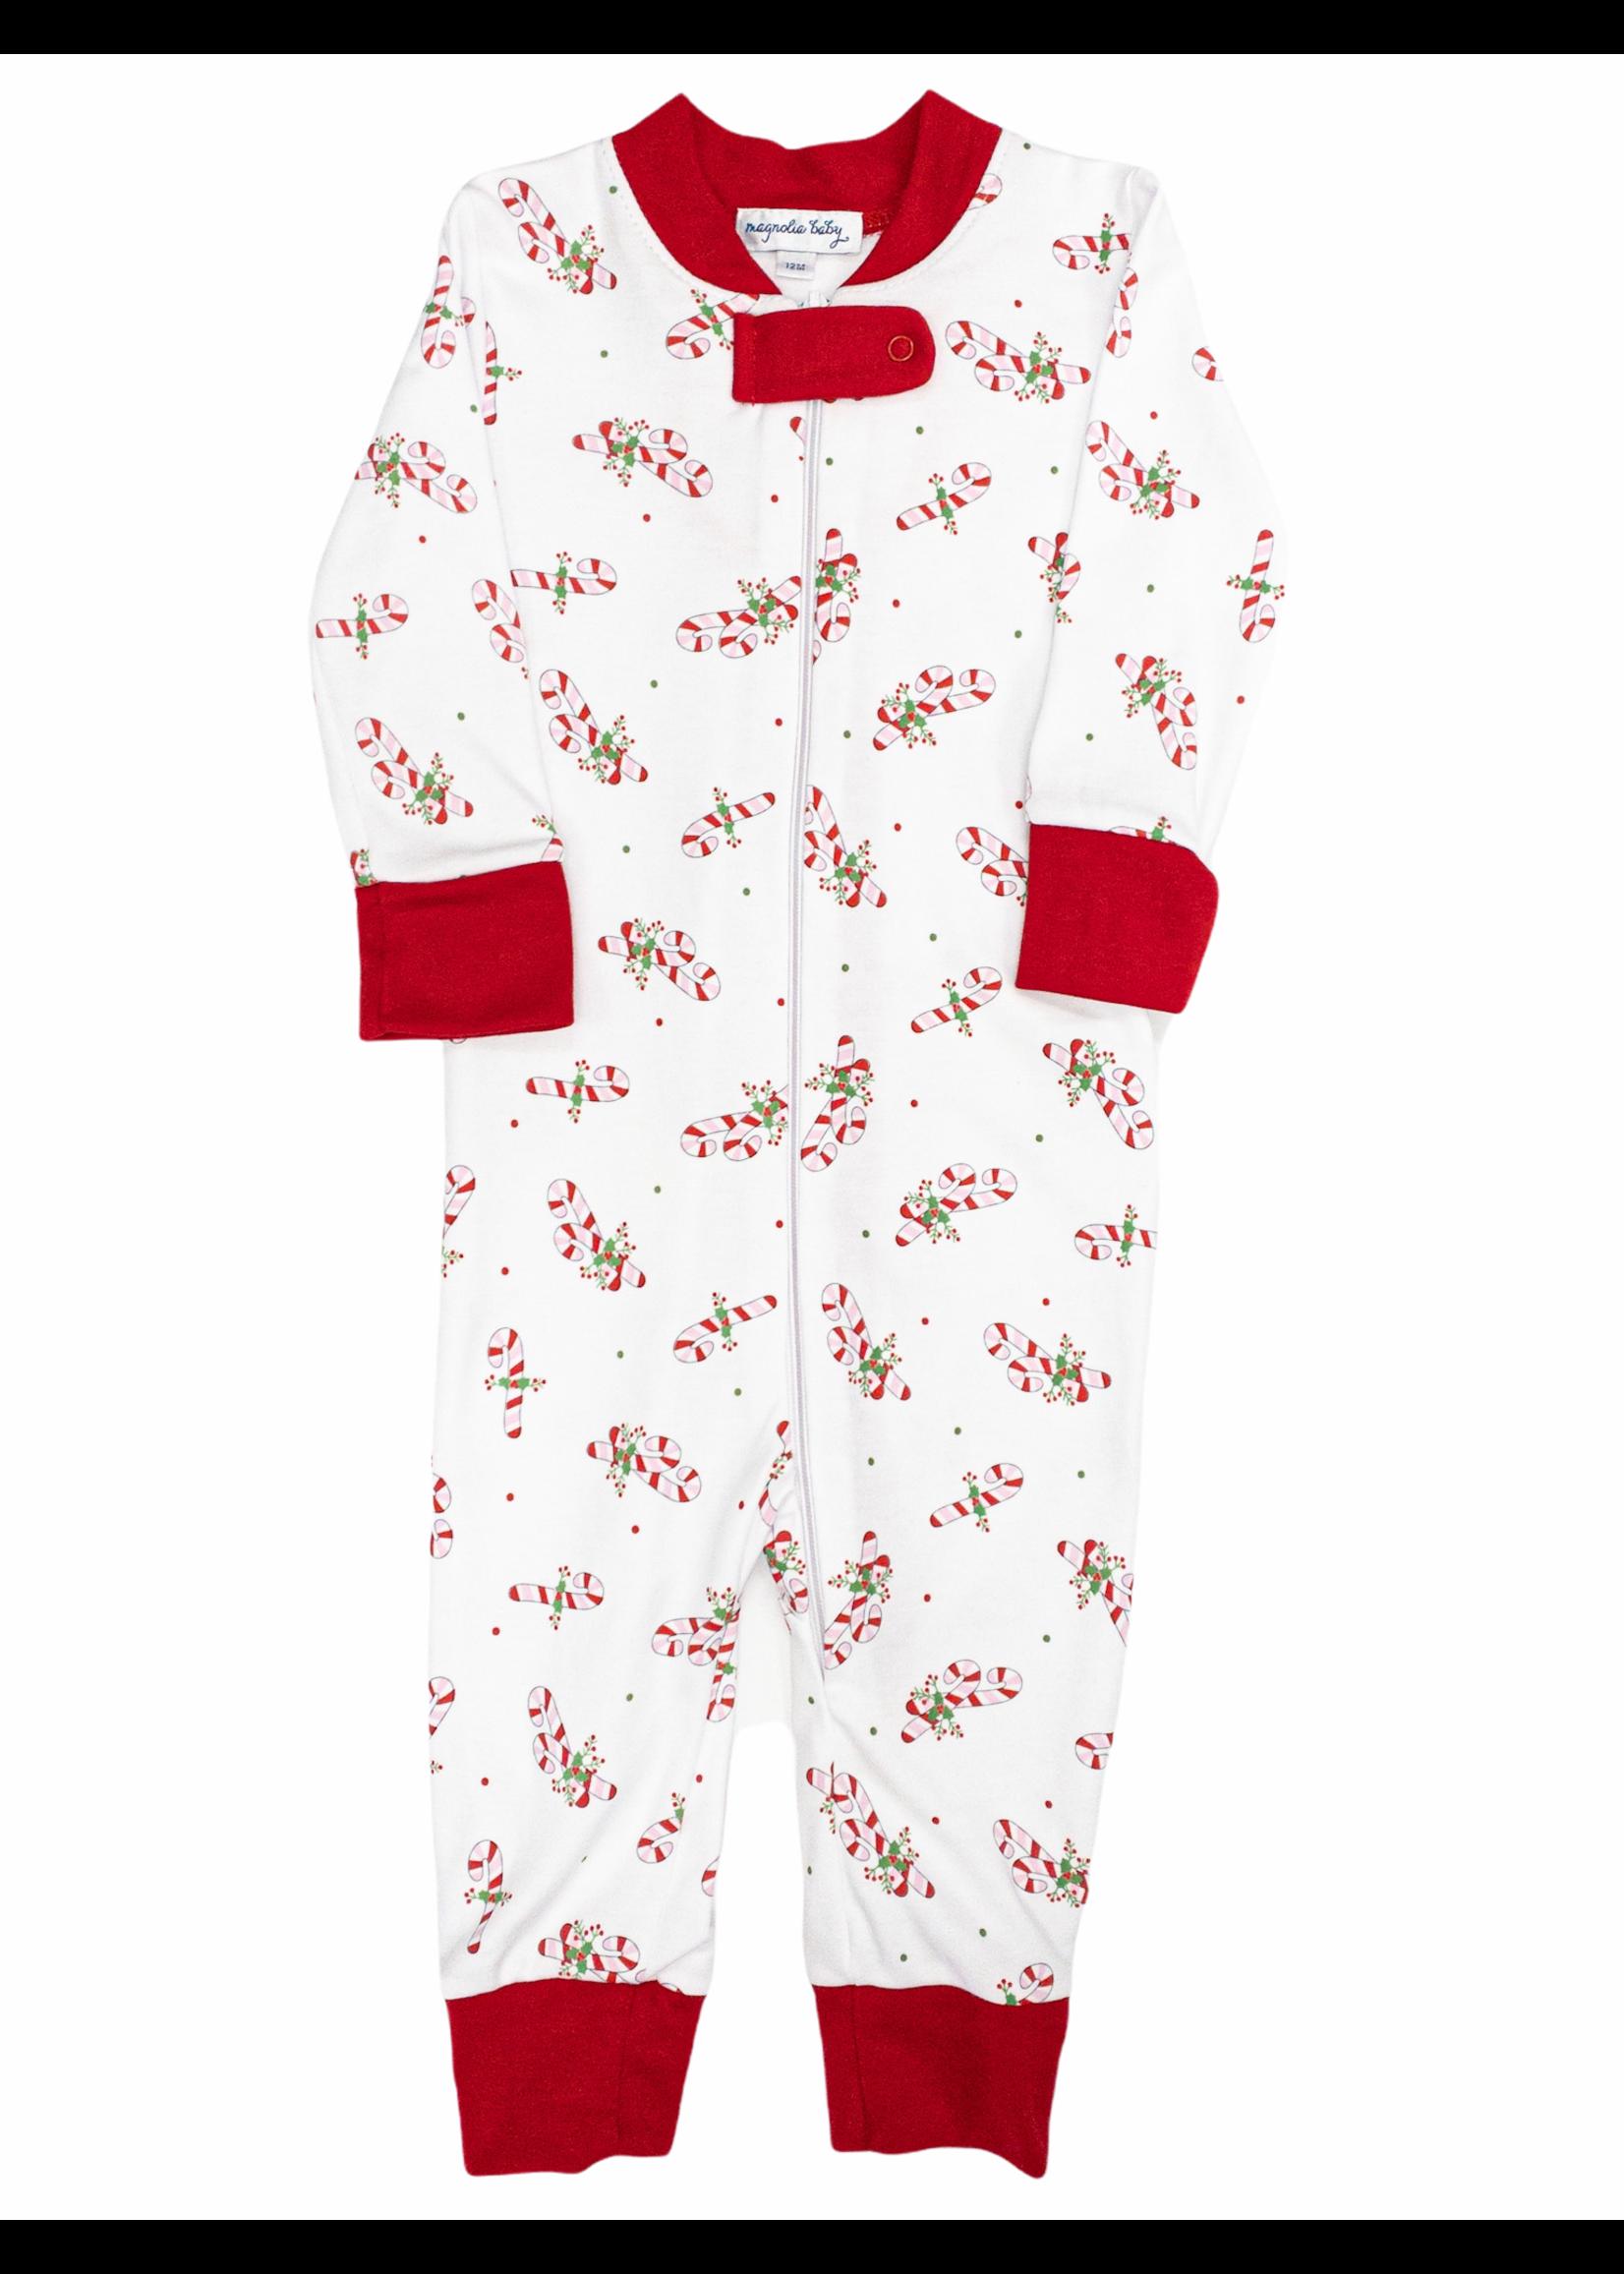 Magnolia Baby Vintage Candy Cane Zipped Pajama